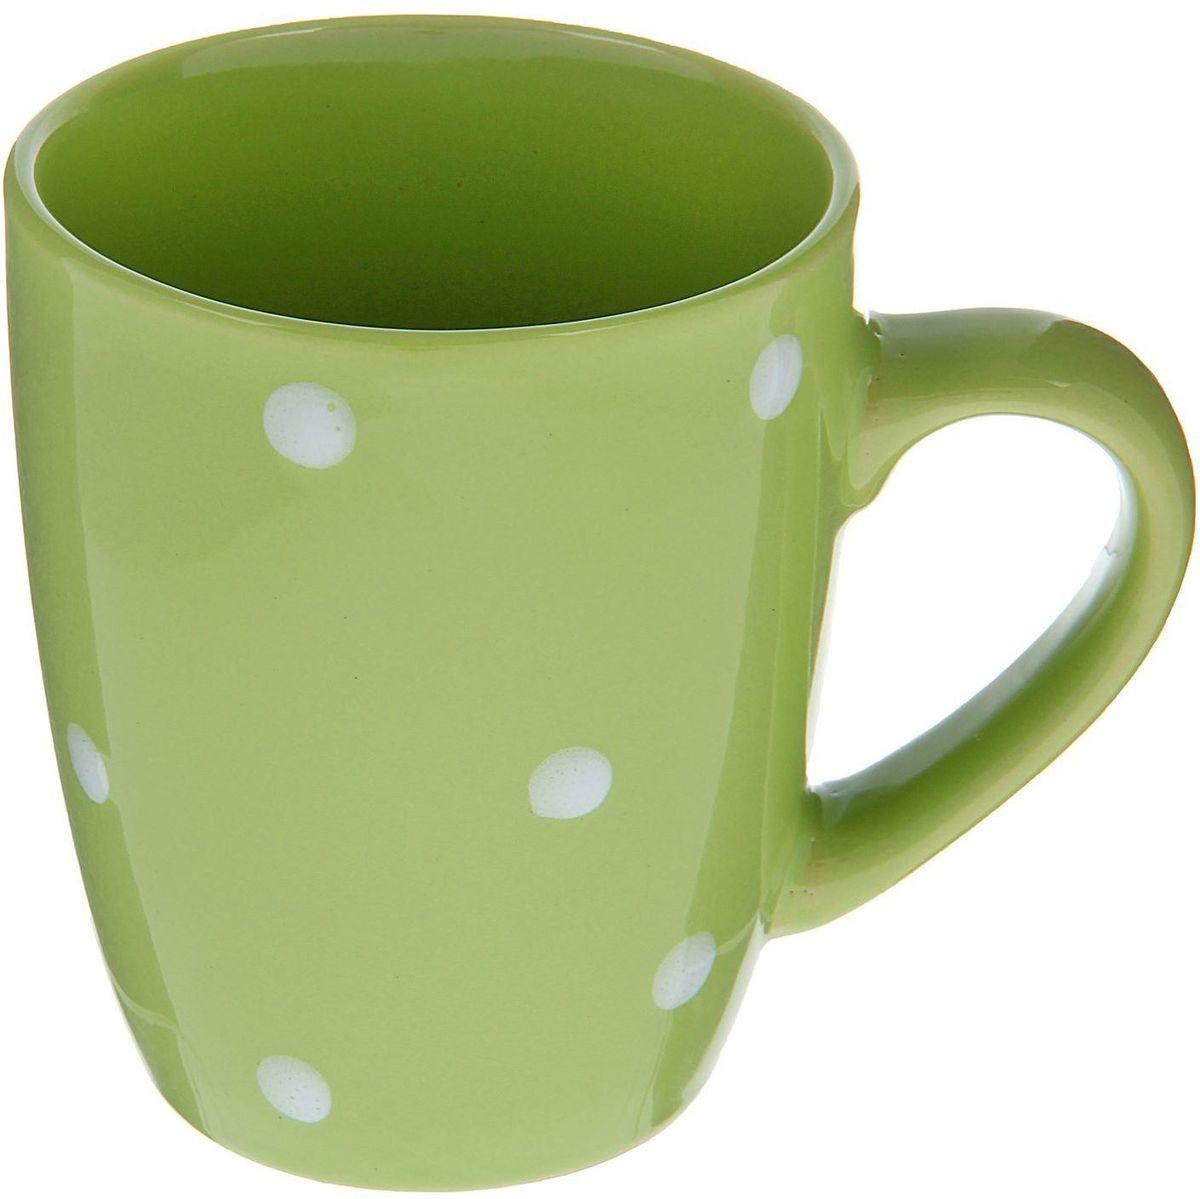 Кружка Доляна Зеленый горох, 360 мл кружка доляна радуга цвет желтый белый 300 мл